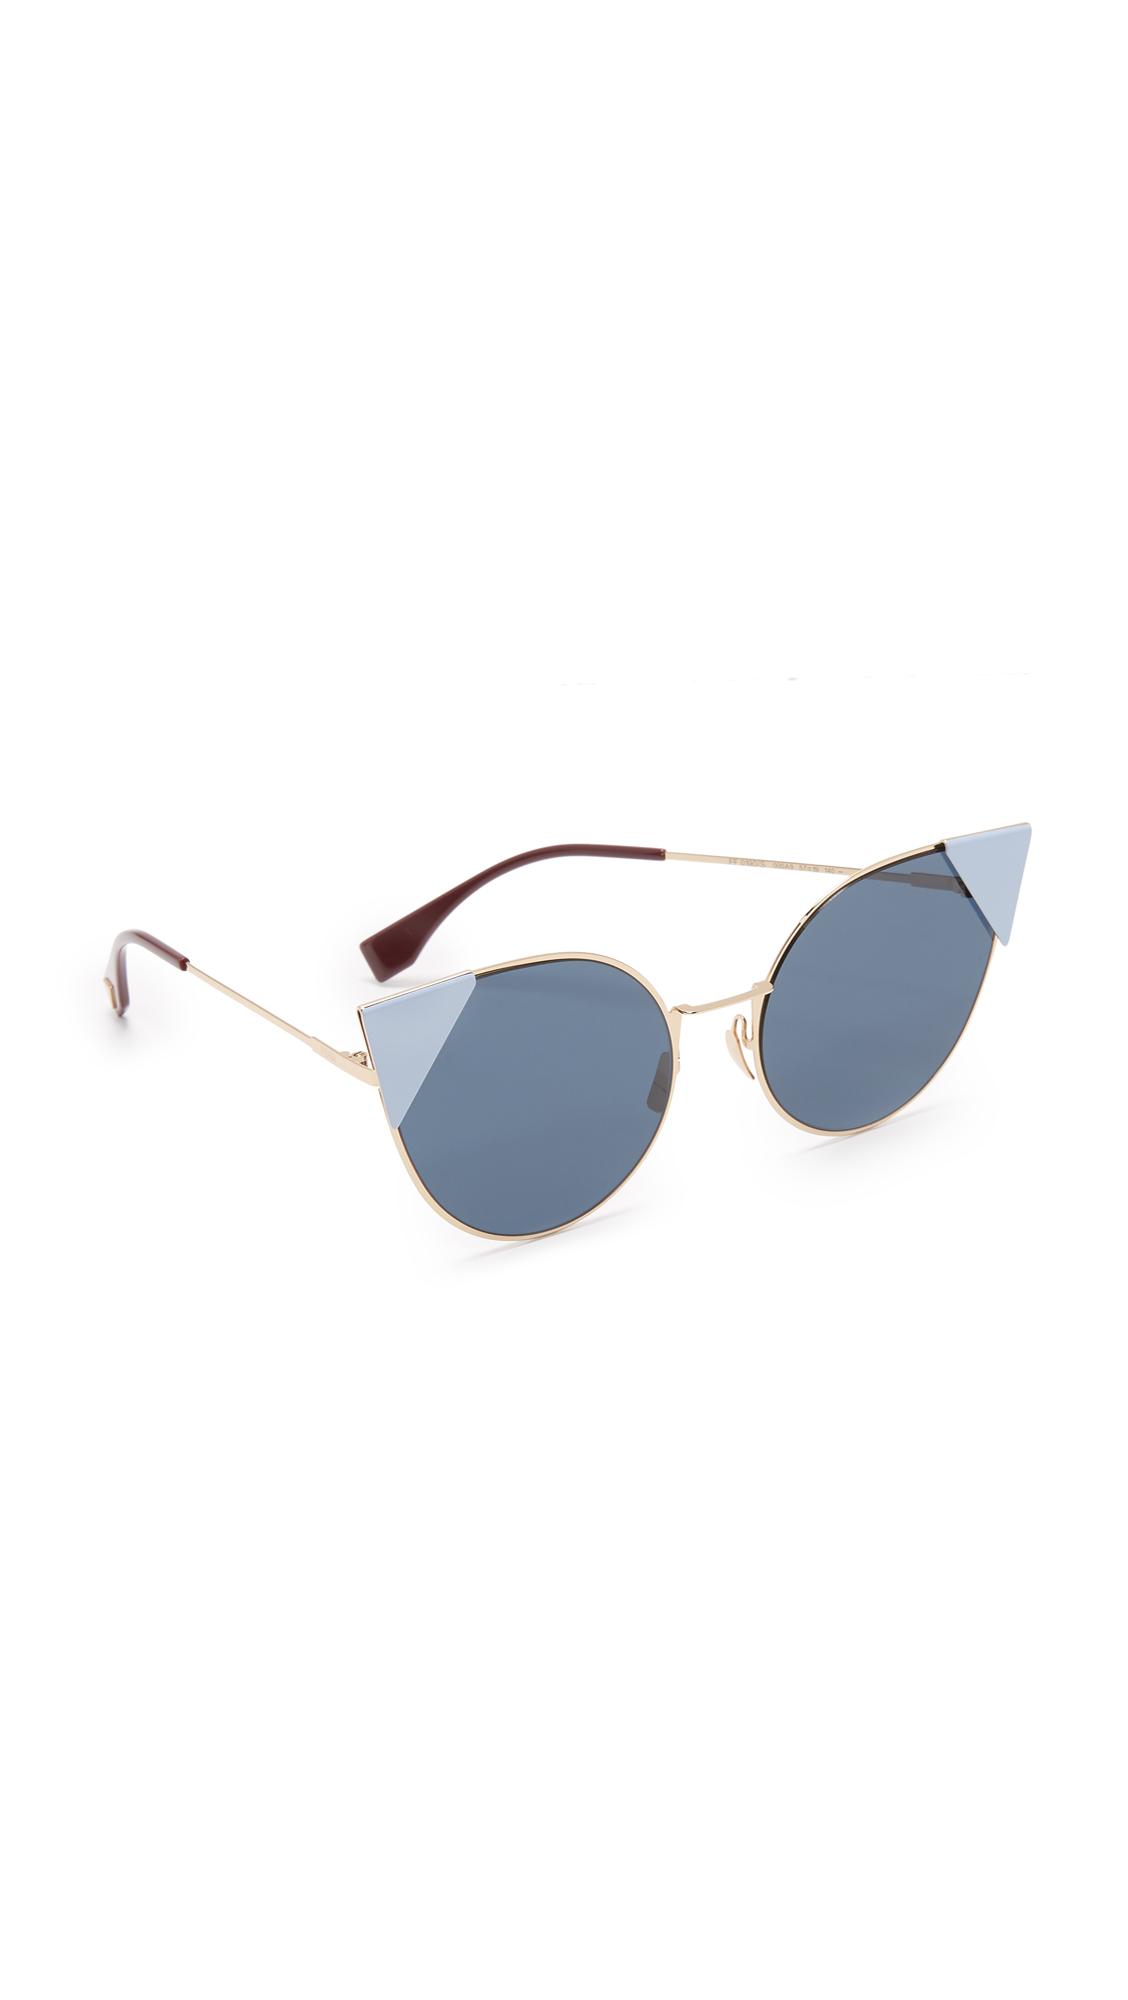 Fendi Arrow Accent Sunglasses - Rose Gold Blue/Blue at Shopbop